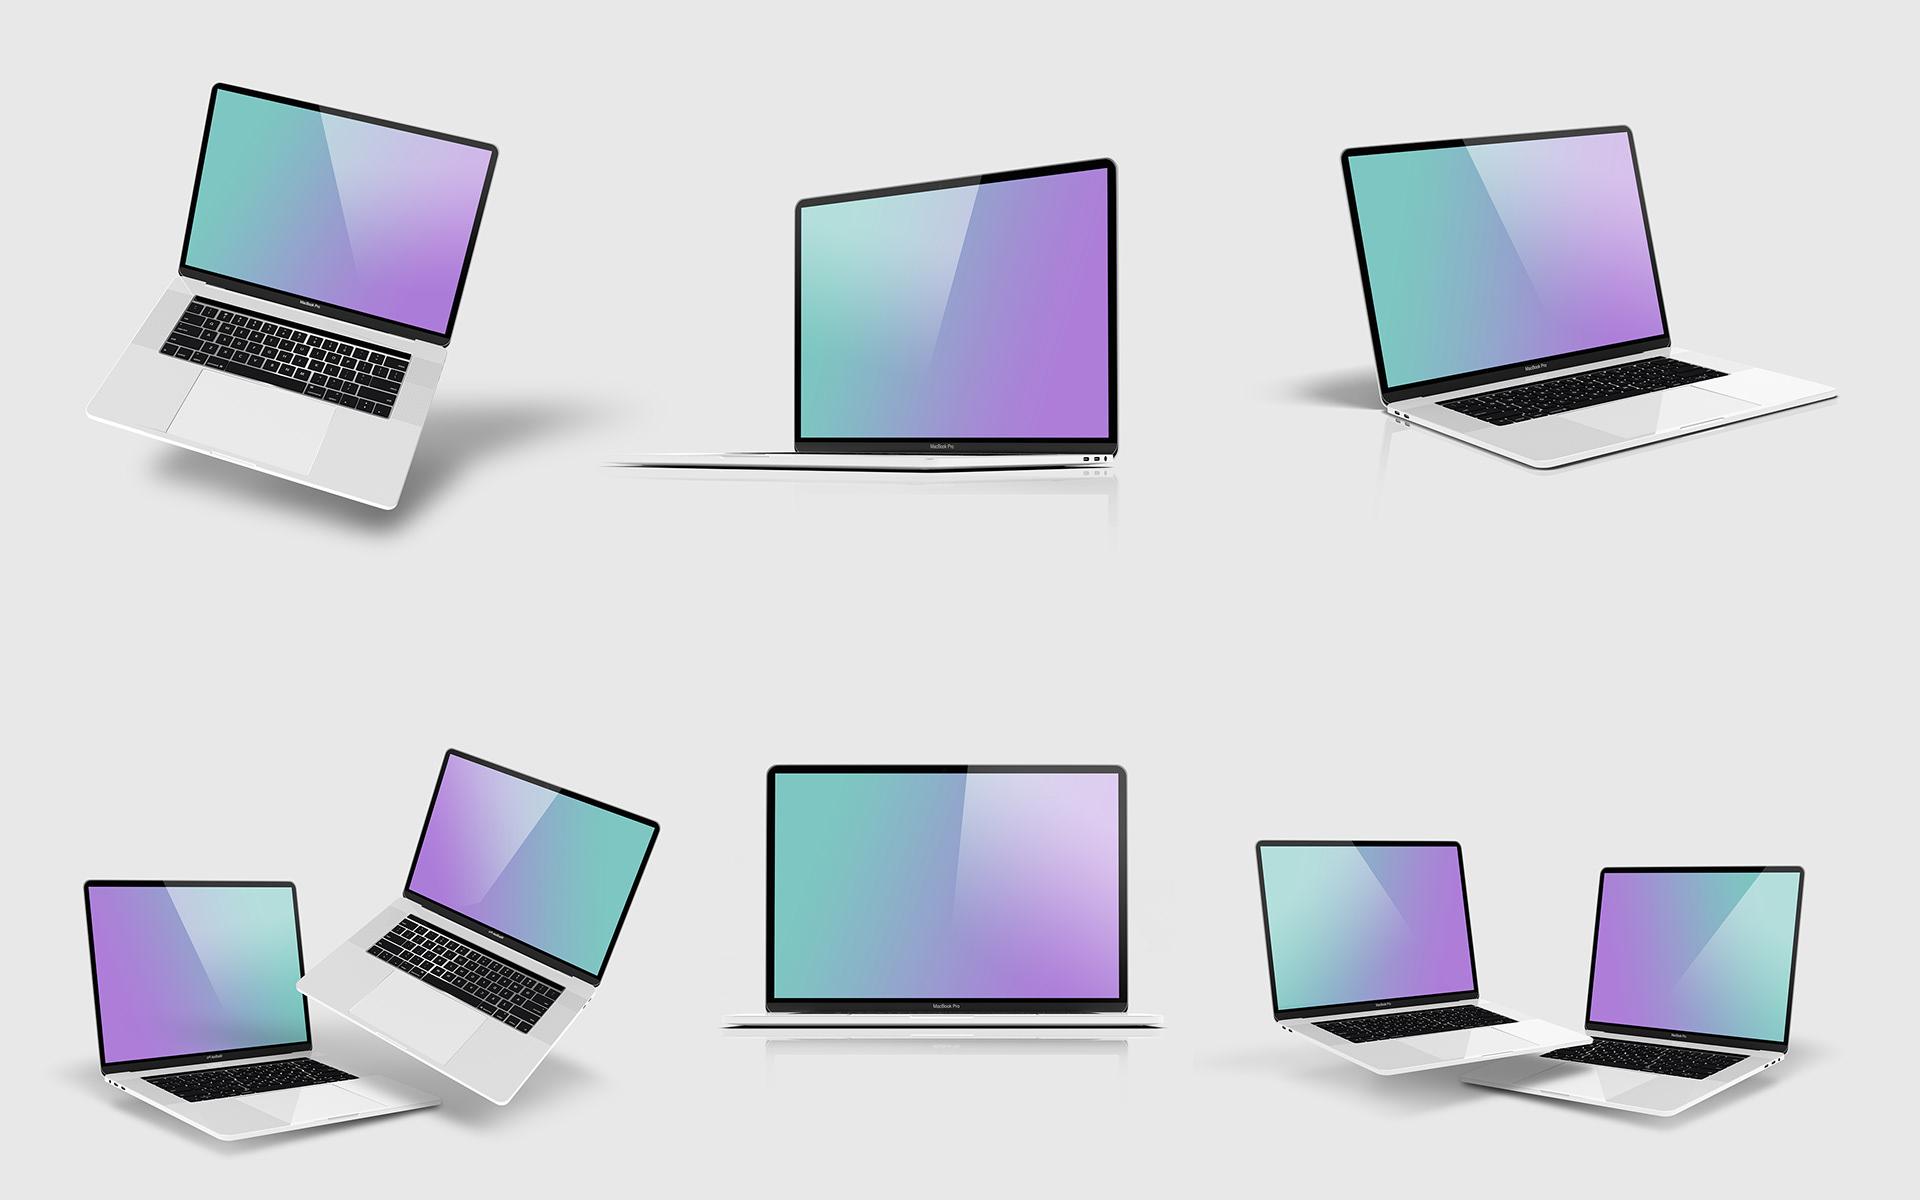 60+ Apple Macbook / PRO & Air Mockup Templates   Decolore Net